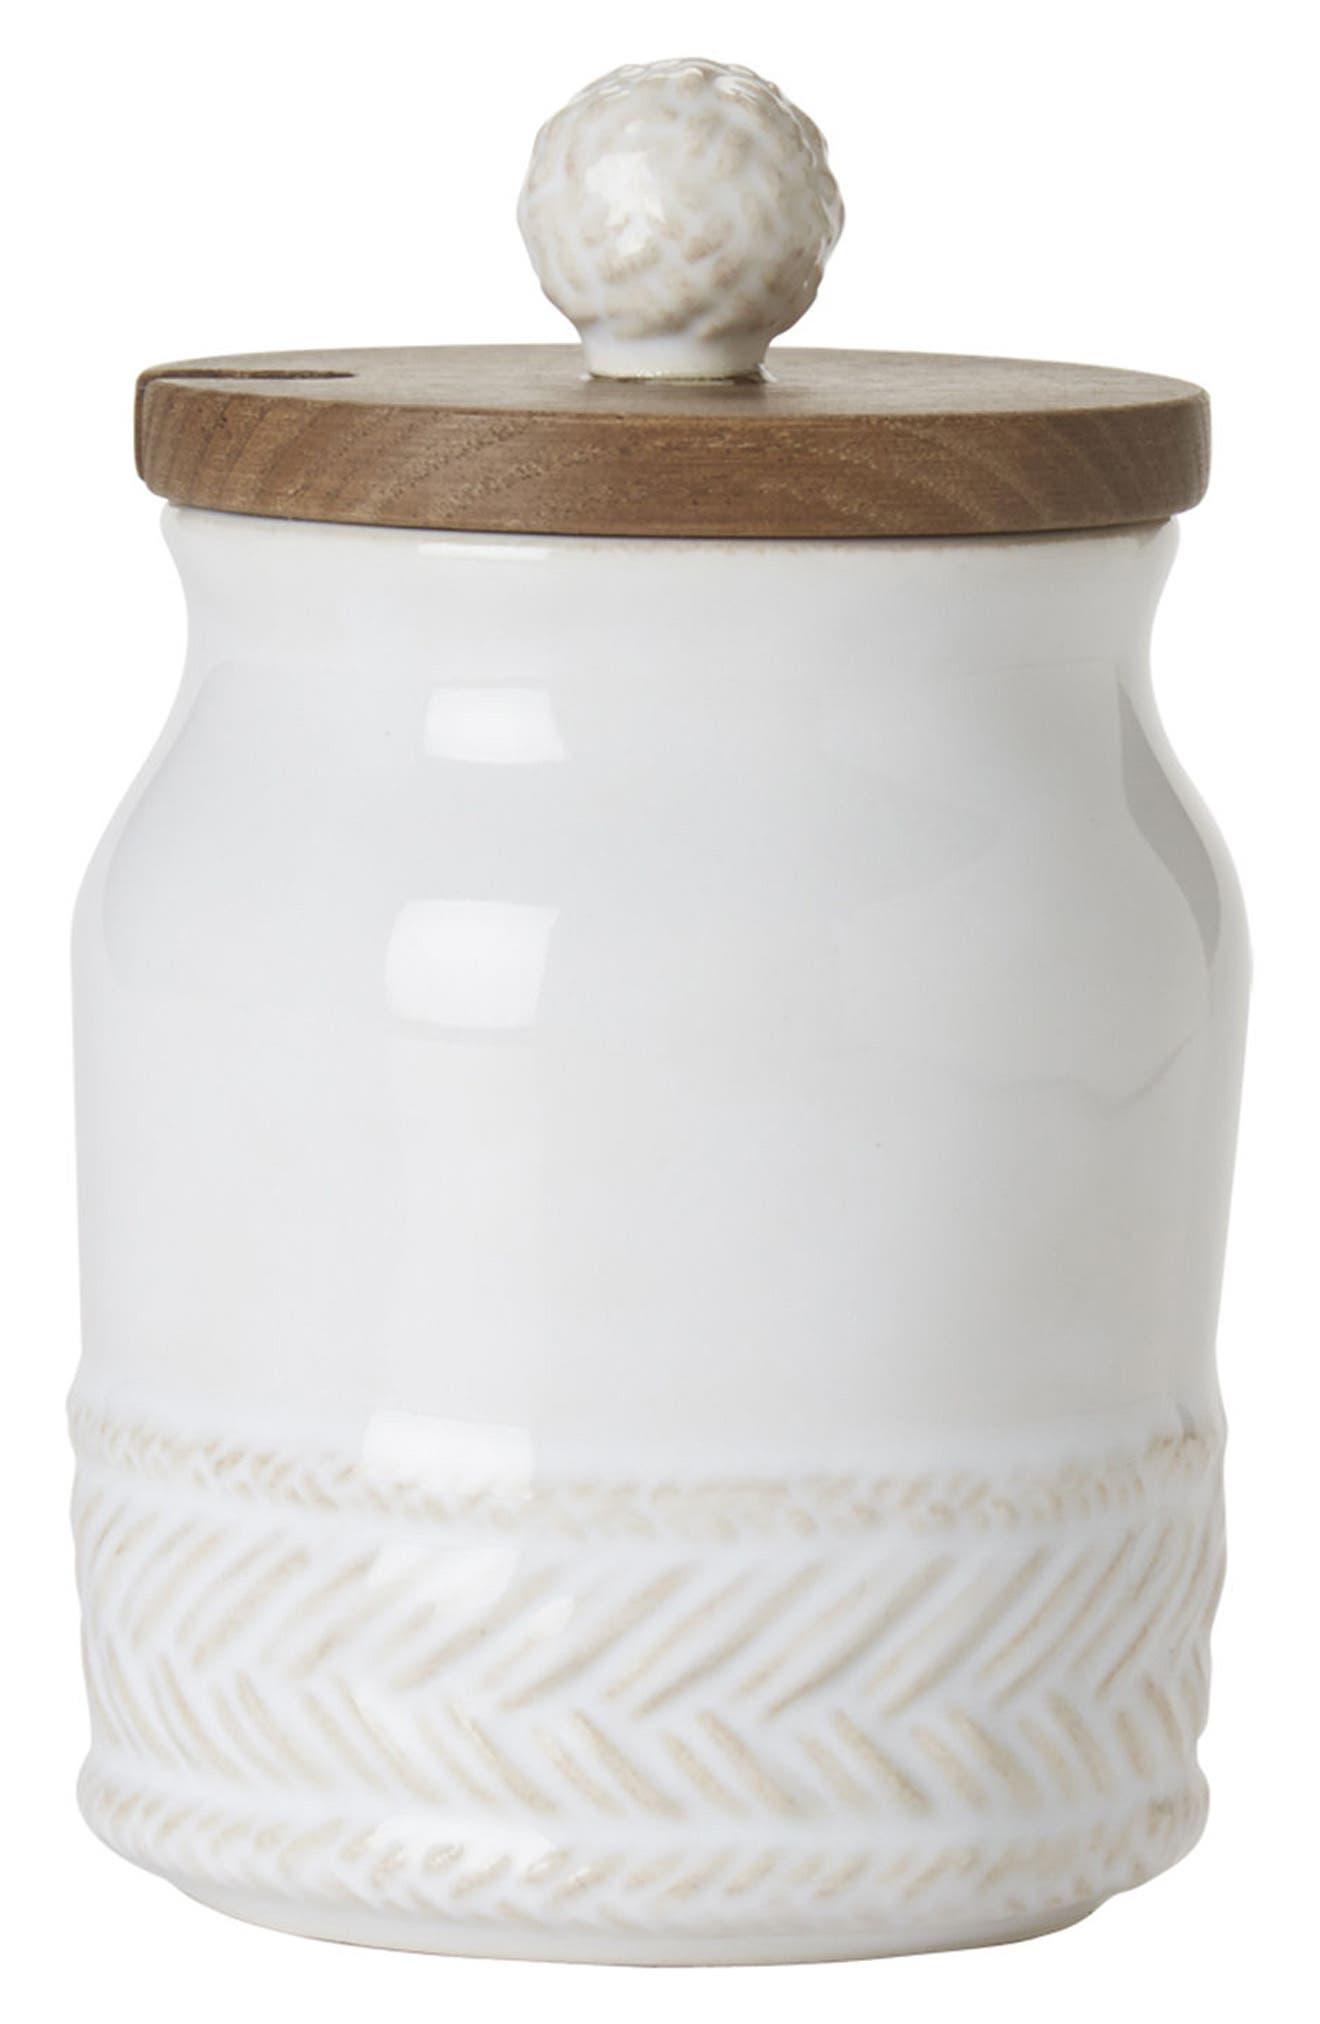 Le Panier Ceramic Sugar Pot,                             Main thumbnail 1, color,                             WHITEWASH